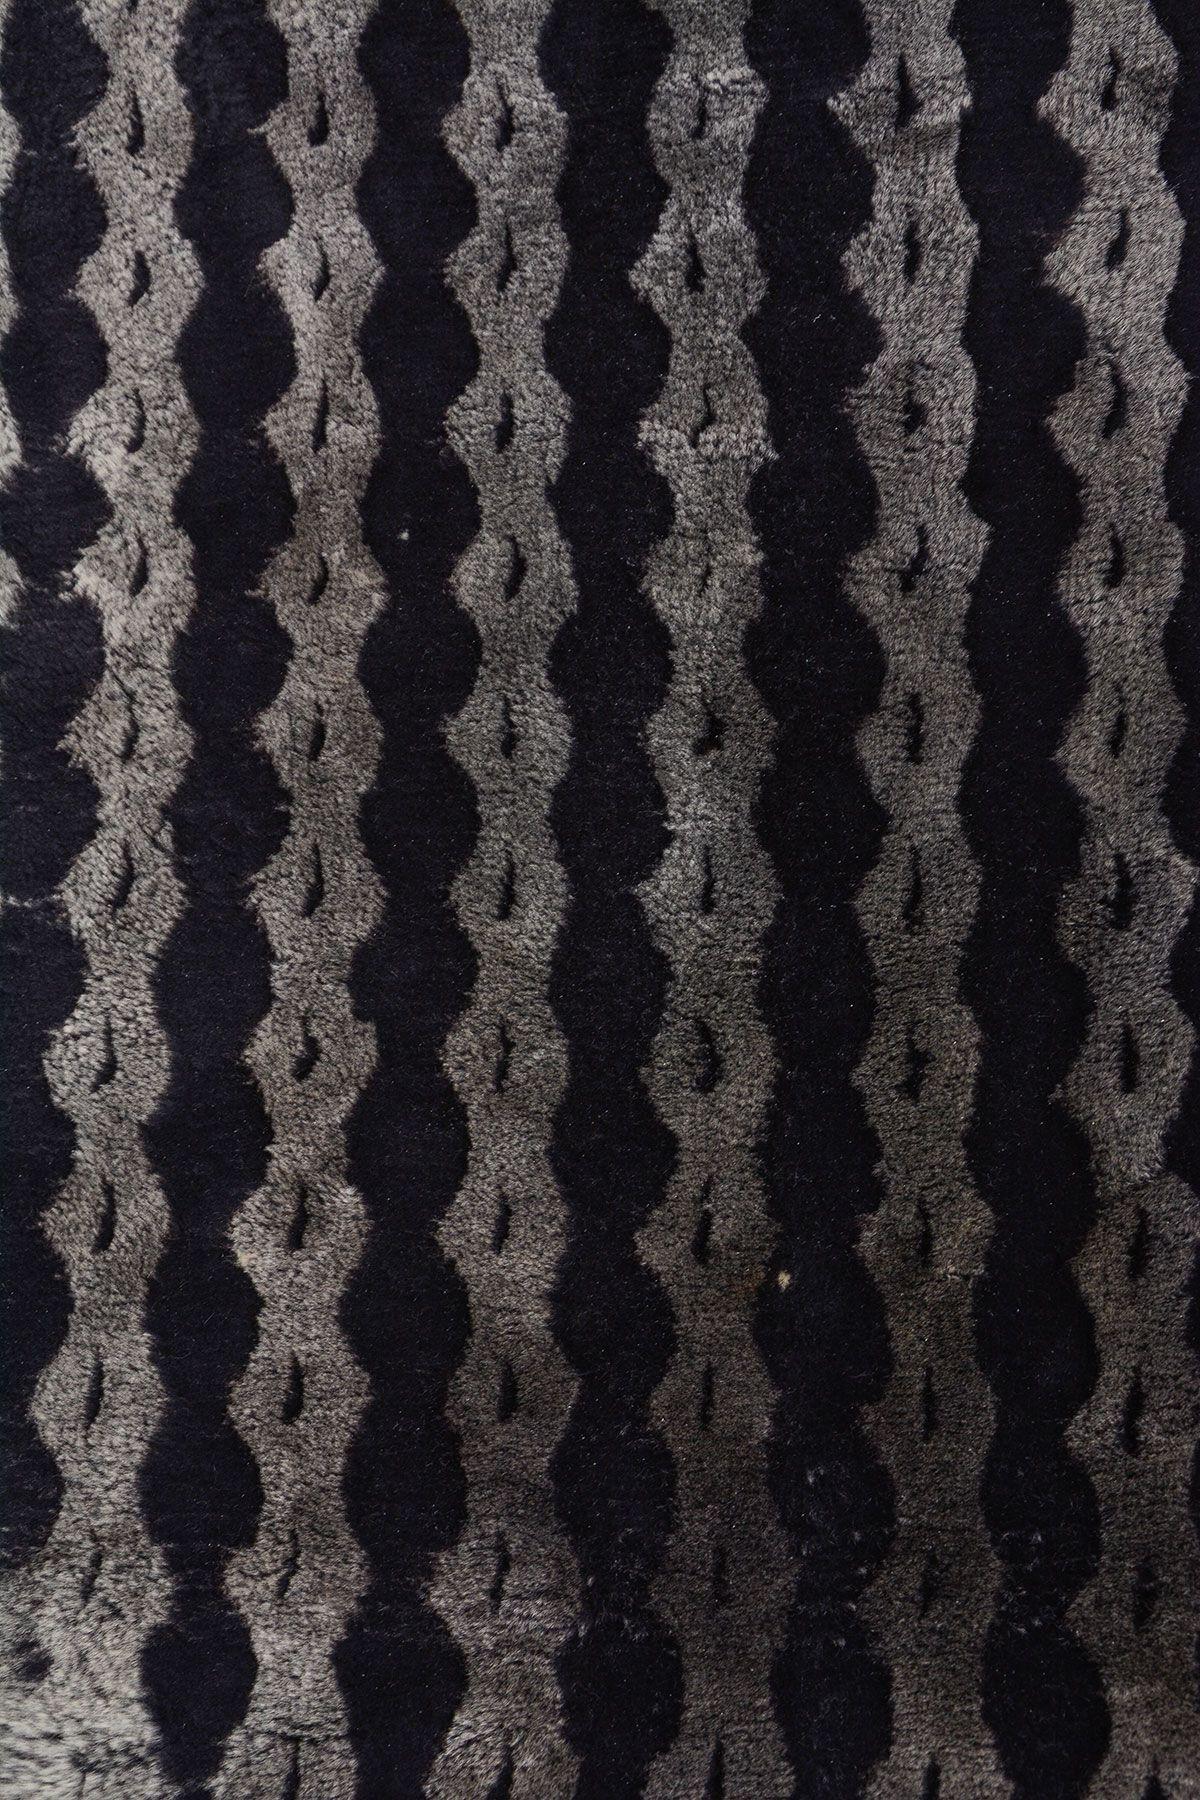 Erdoğan Deri Genuine Leather Natural Embossed Sheepskin Rug DKR064 Black